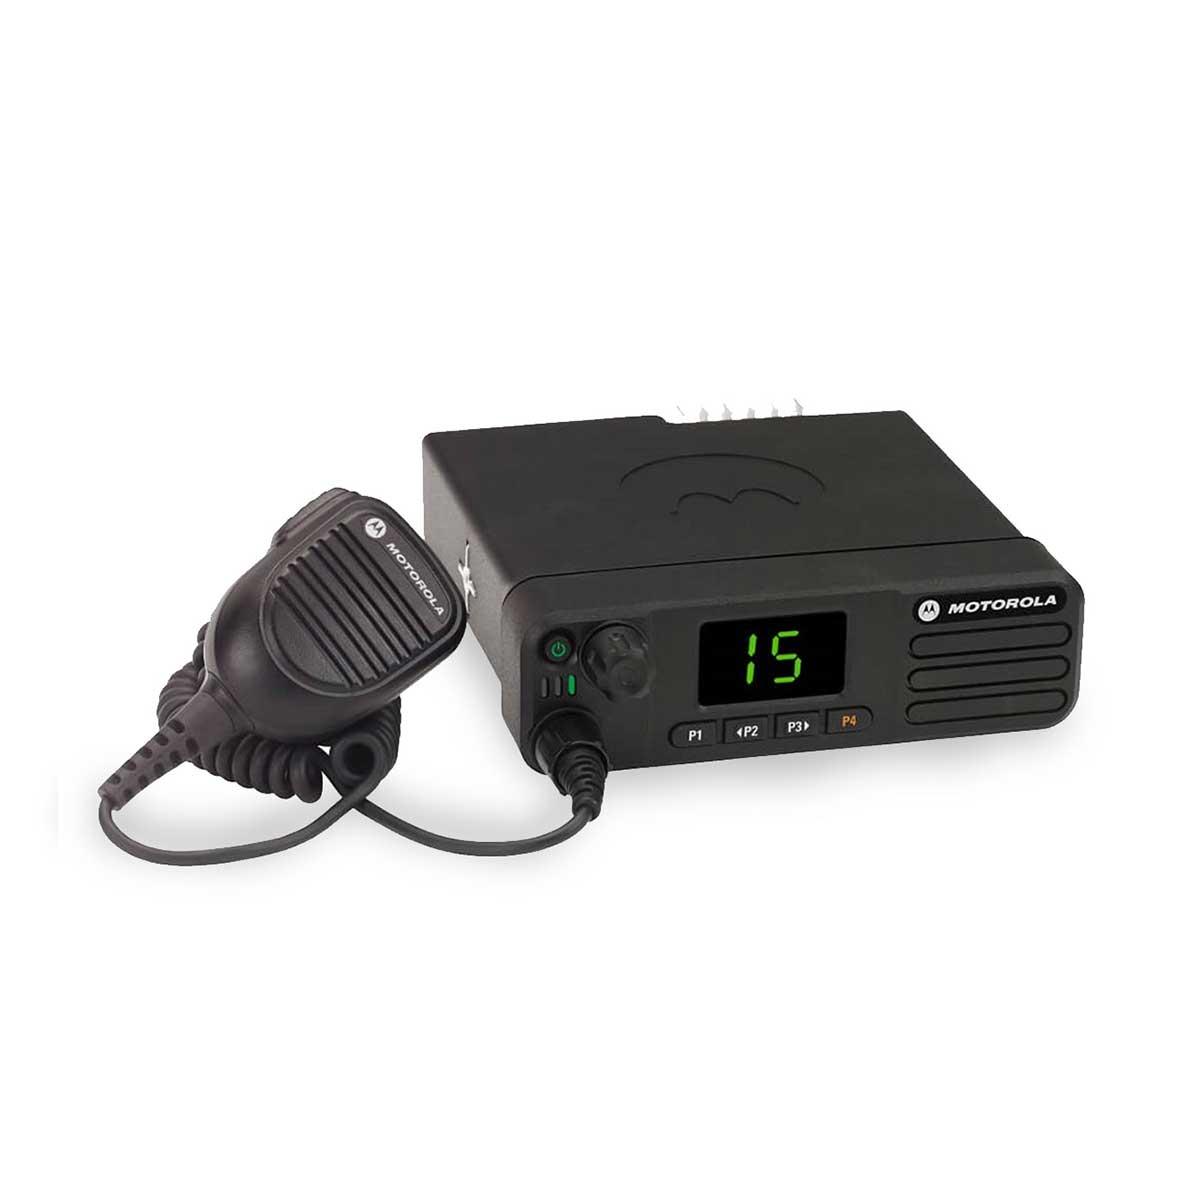 Radio Motorola DGM5000 Digital LAM28QPC9MA1AN UHF 403-470 MHZ de 40W